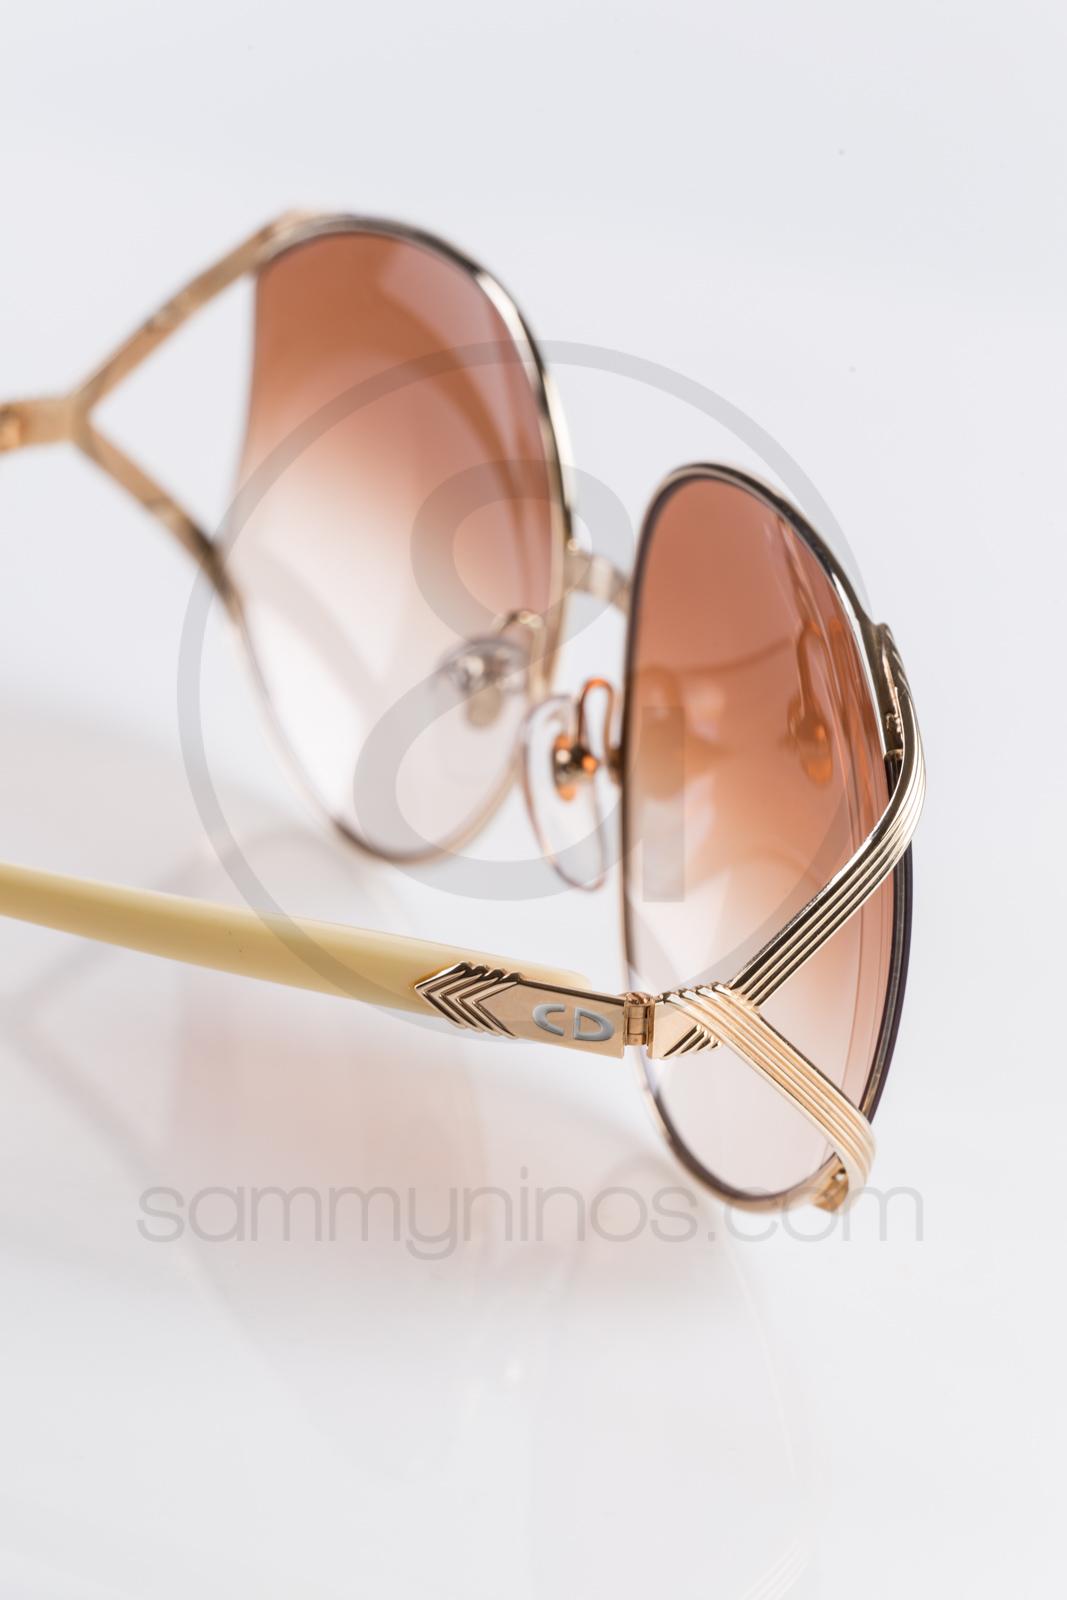 653247eebf78 Fabulous Christian Dior 2250 – Sammy   Nino s Store KB22